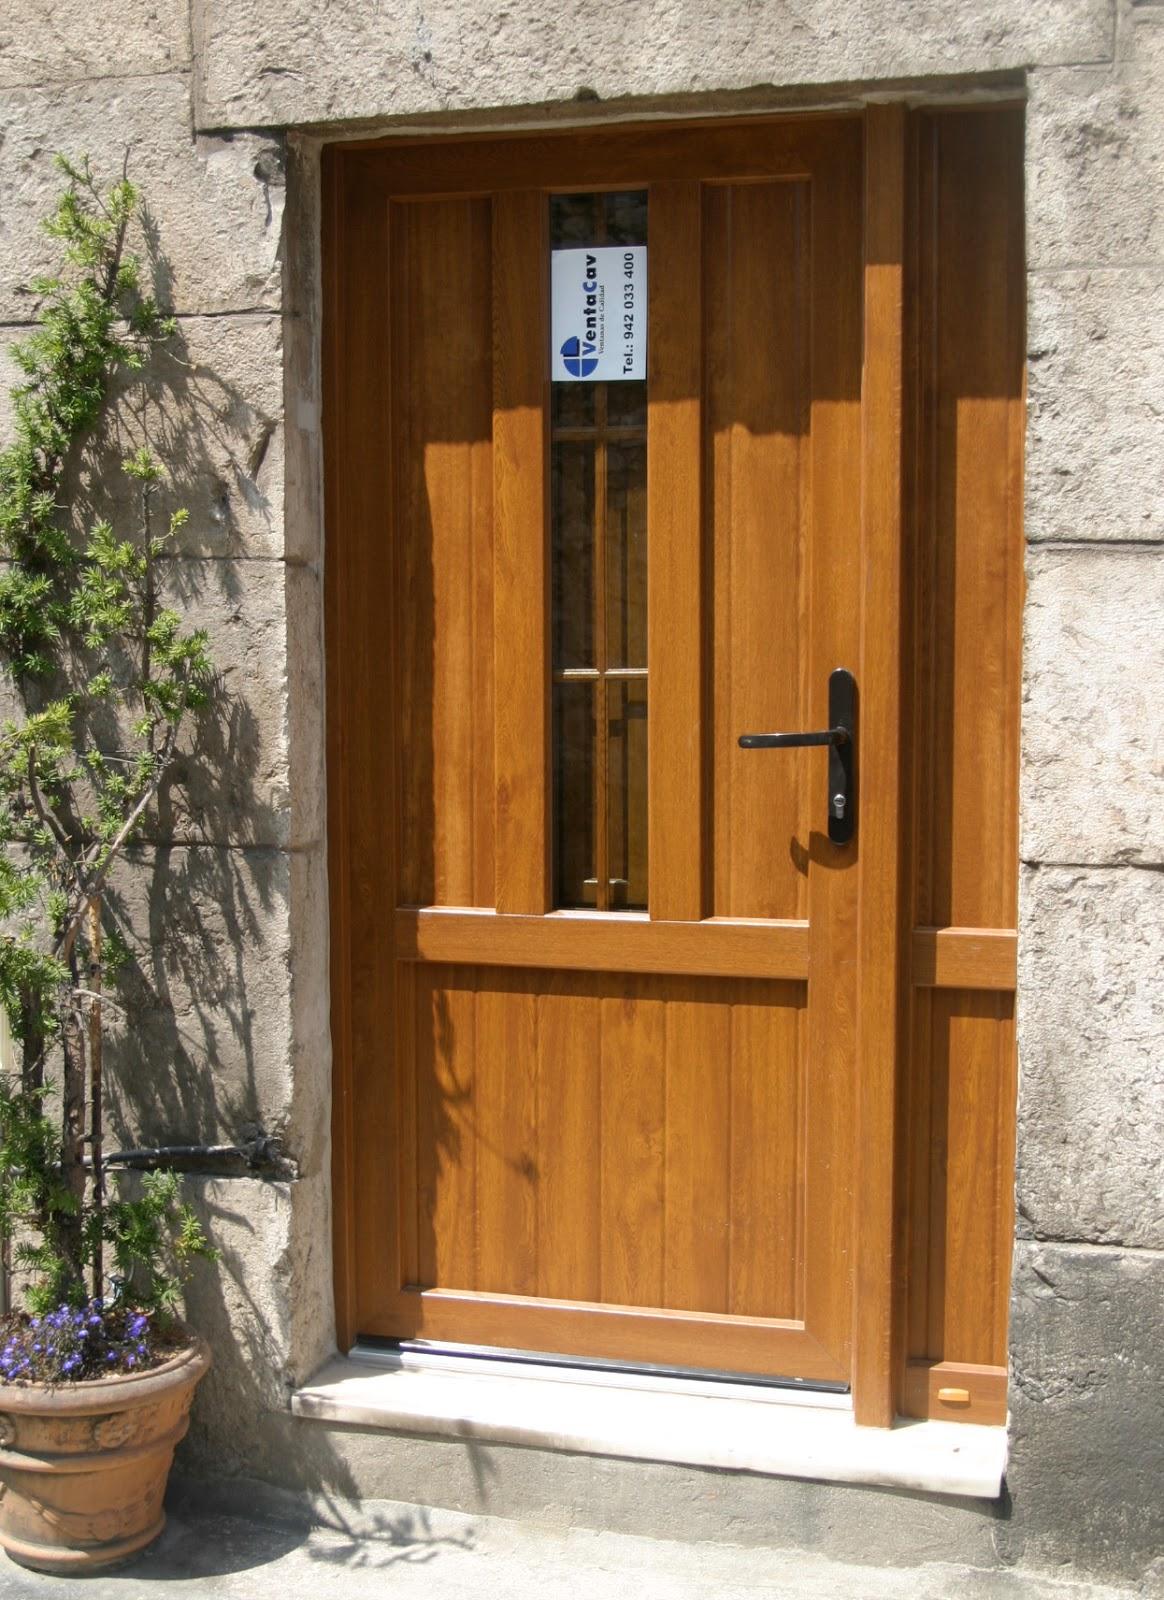 Ventanas de PVC Cantabria-Ventacav - Ventanas y Puertas de Aluminio ...